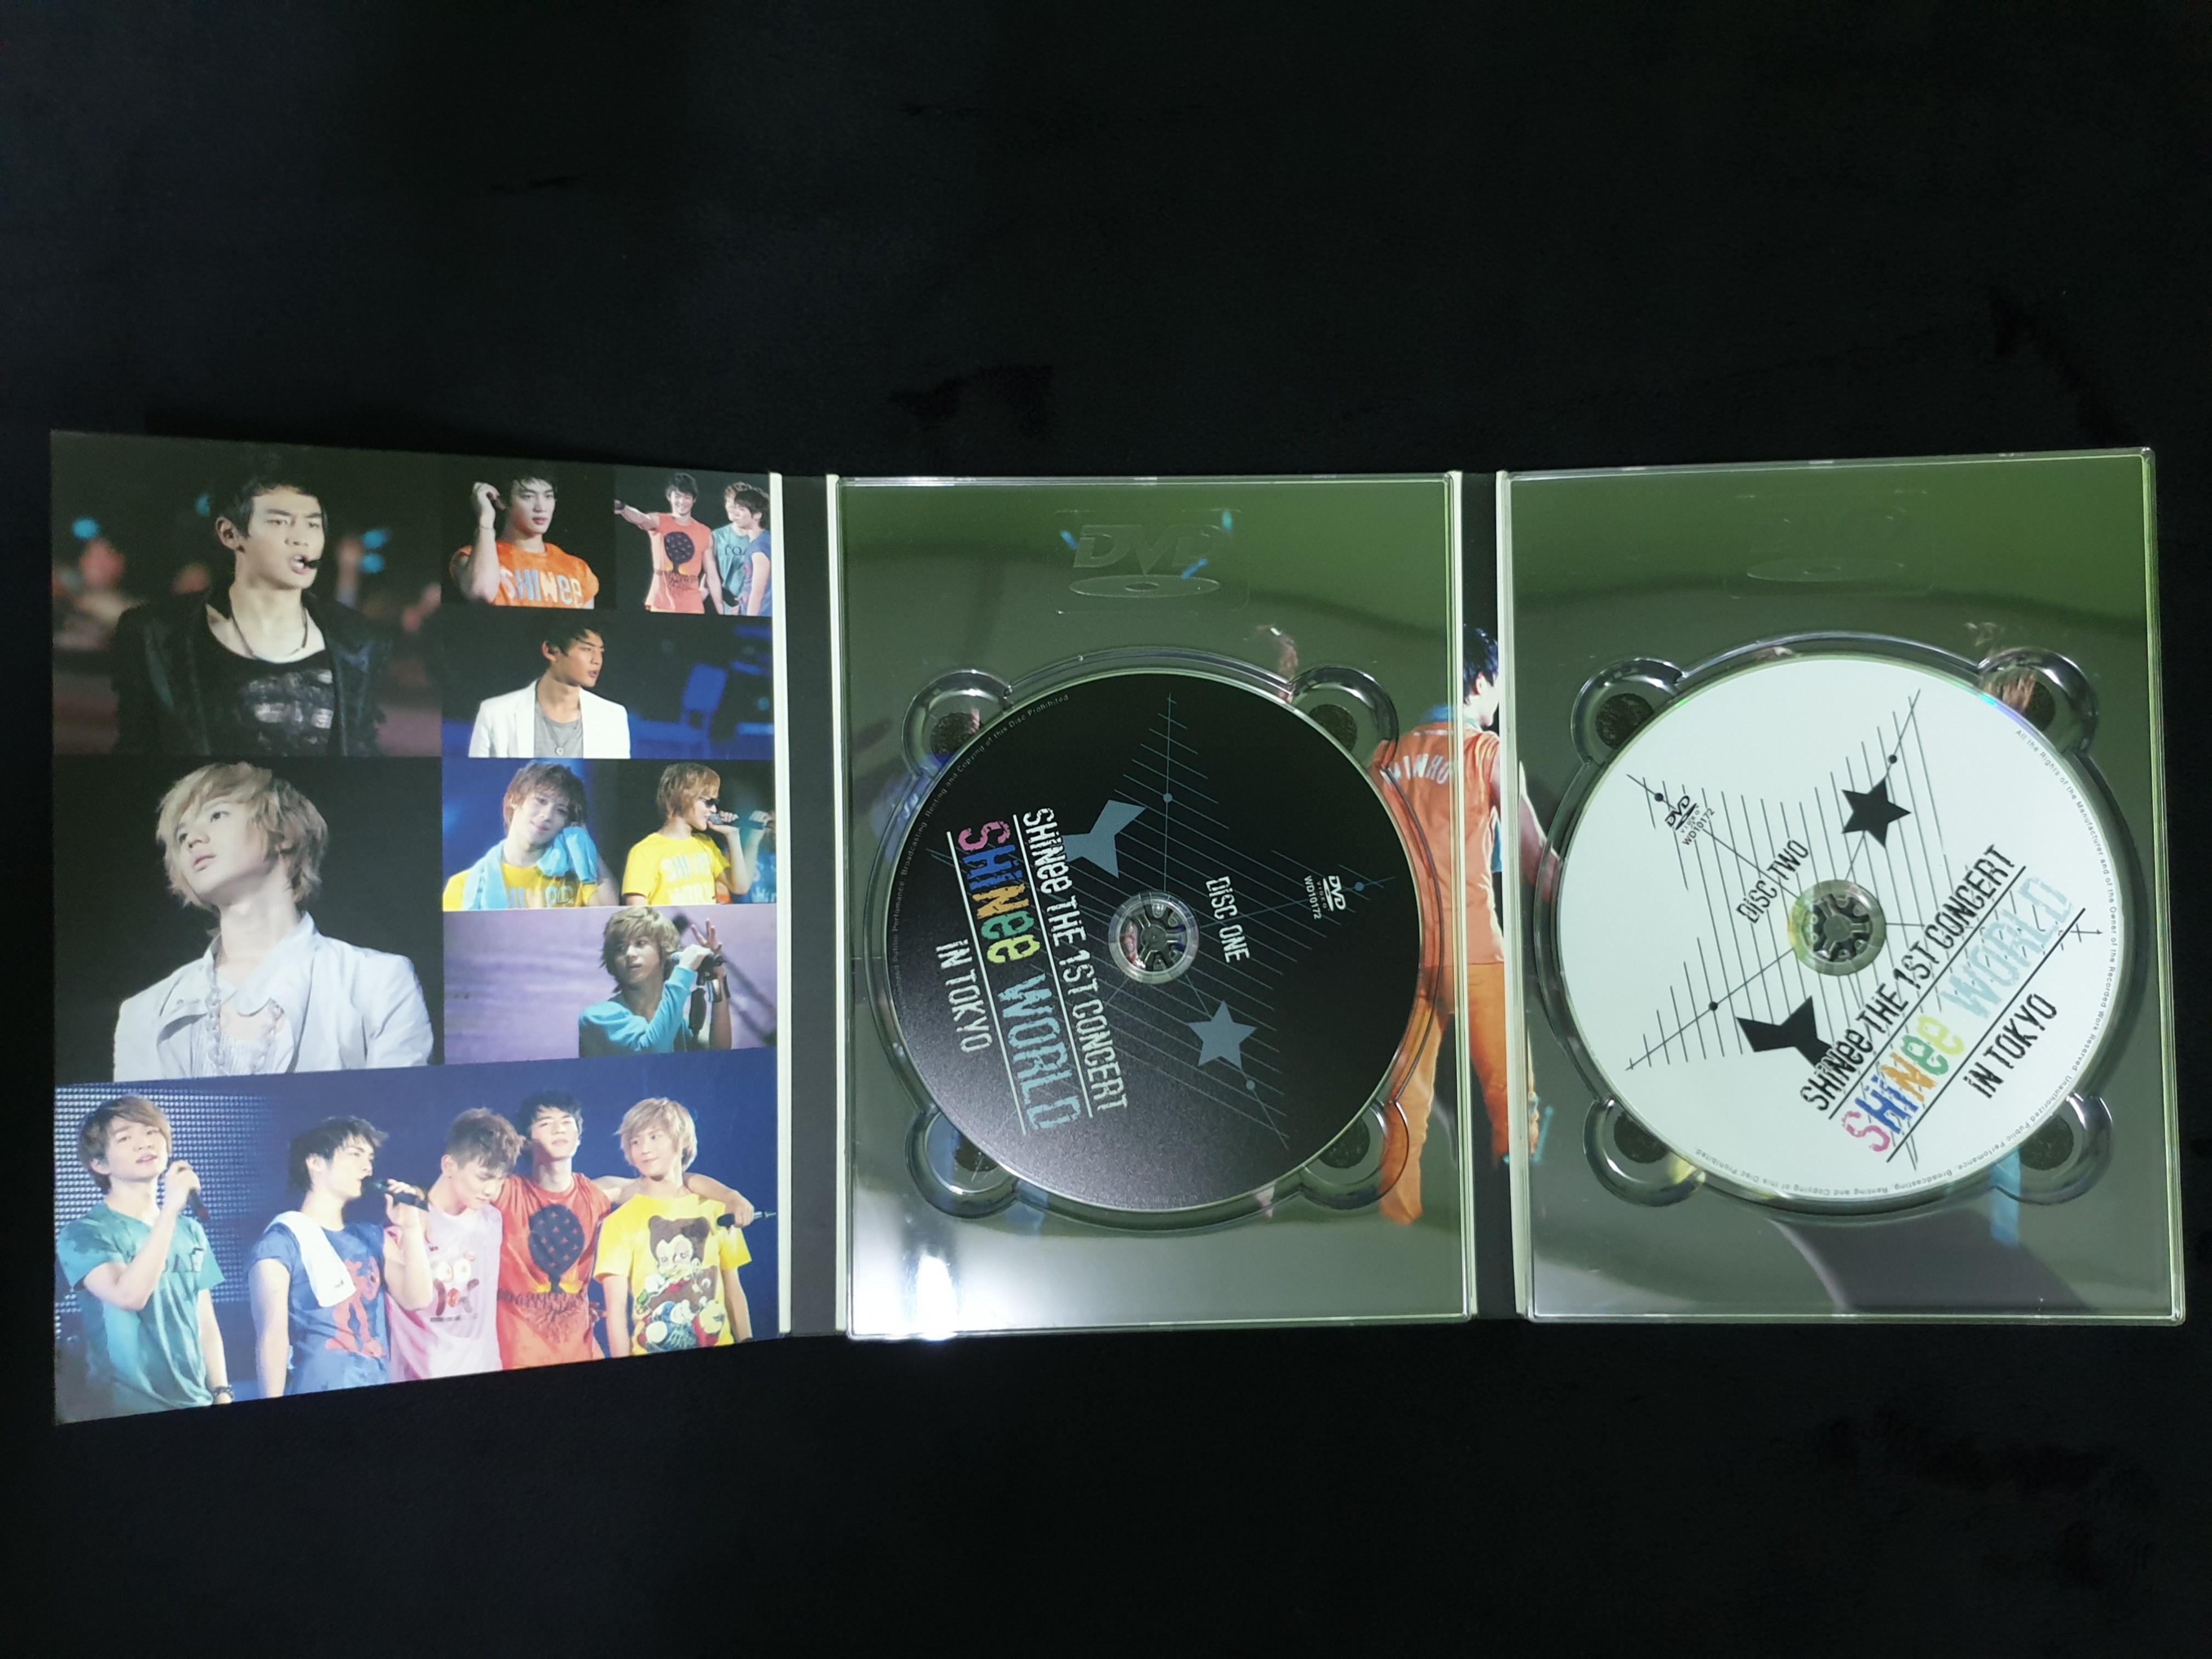 SHINee The 1st Concert 'SHINee World' in Tokyo DVD